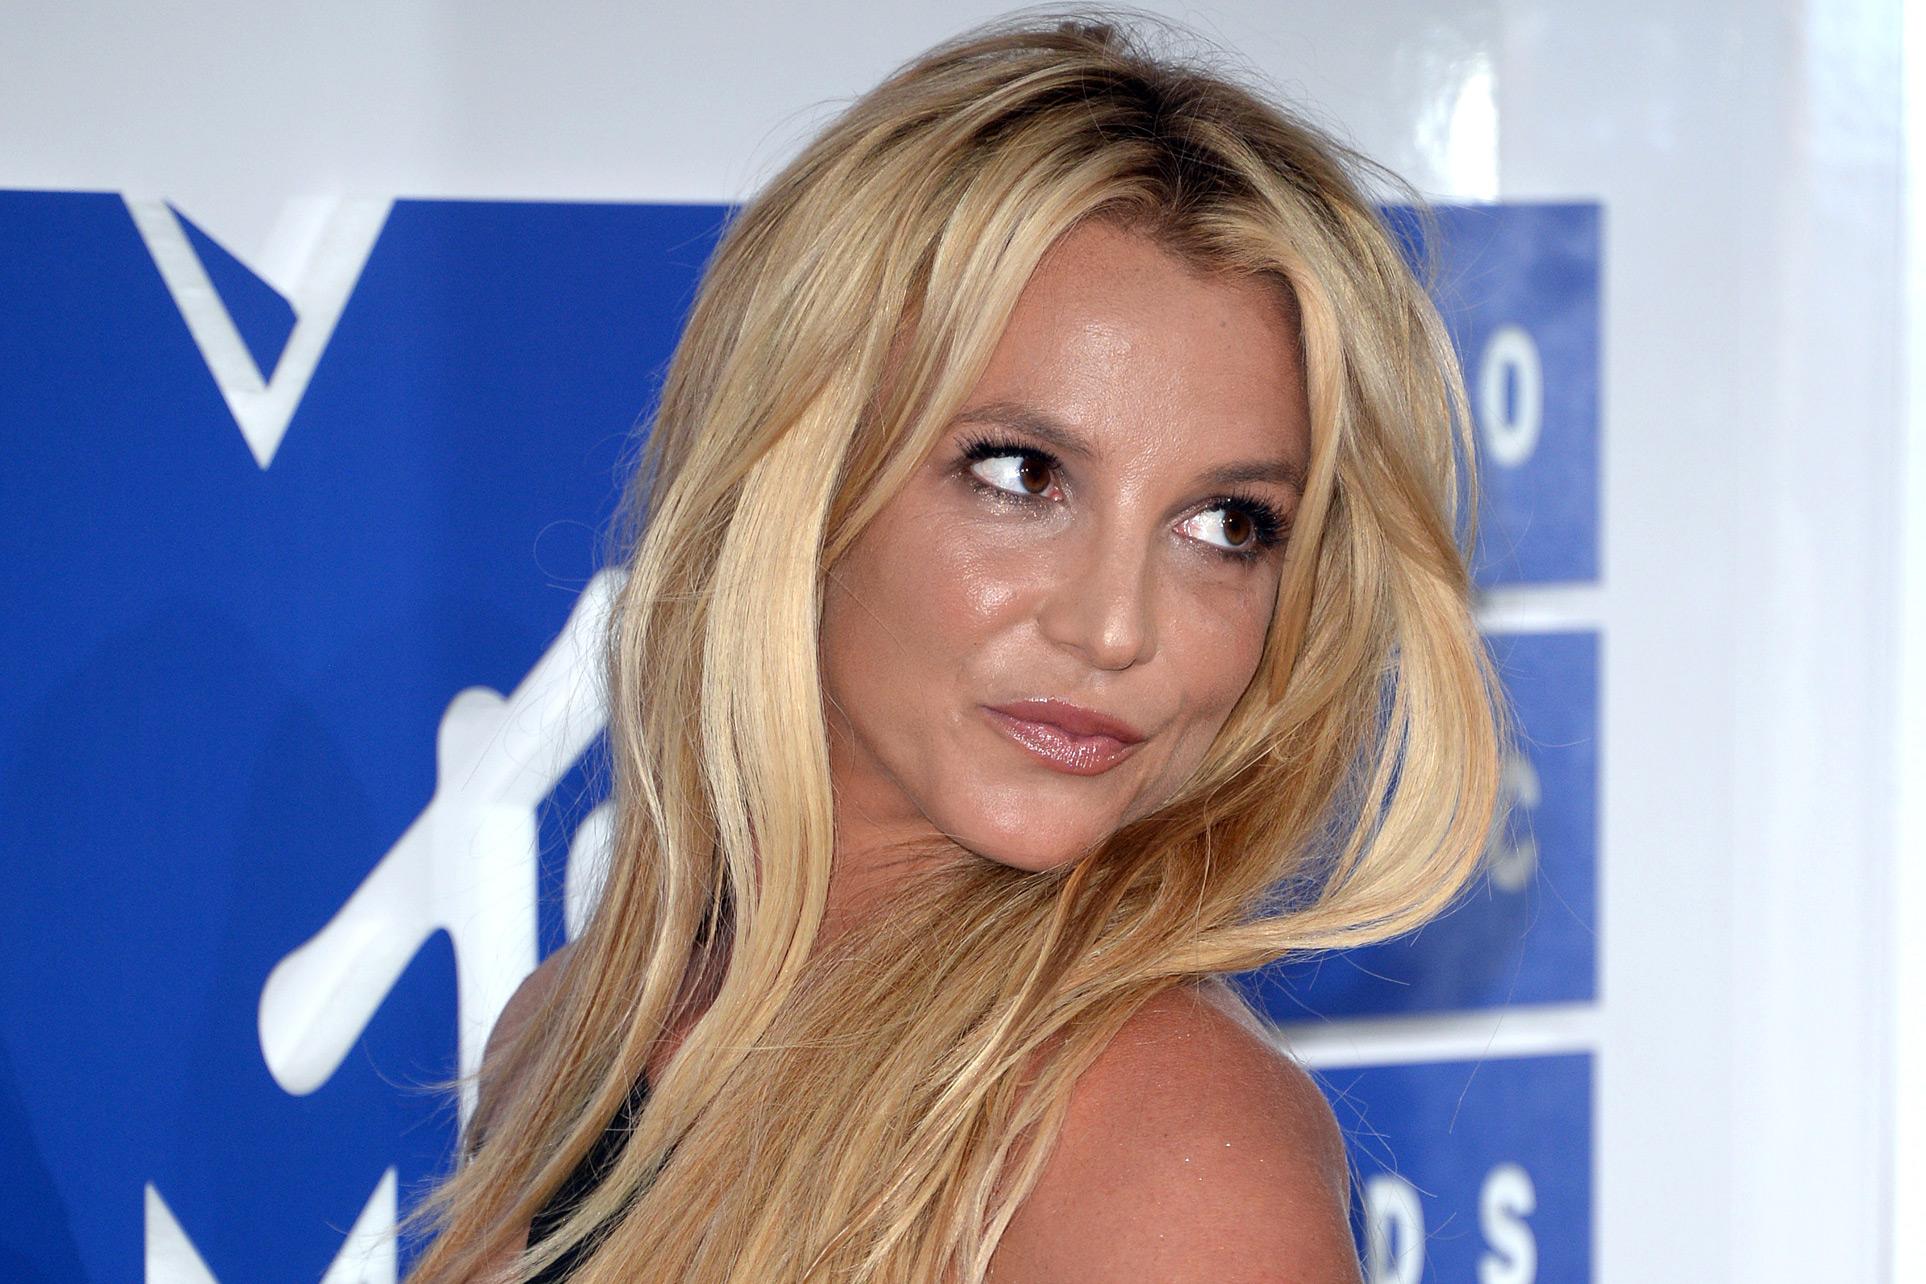 #FreeBritney: Understanding the Fan-led Britney Spears Movement